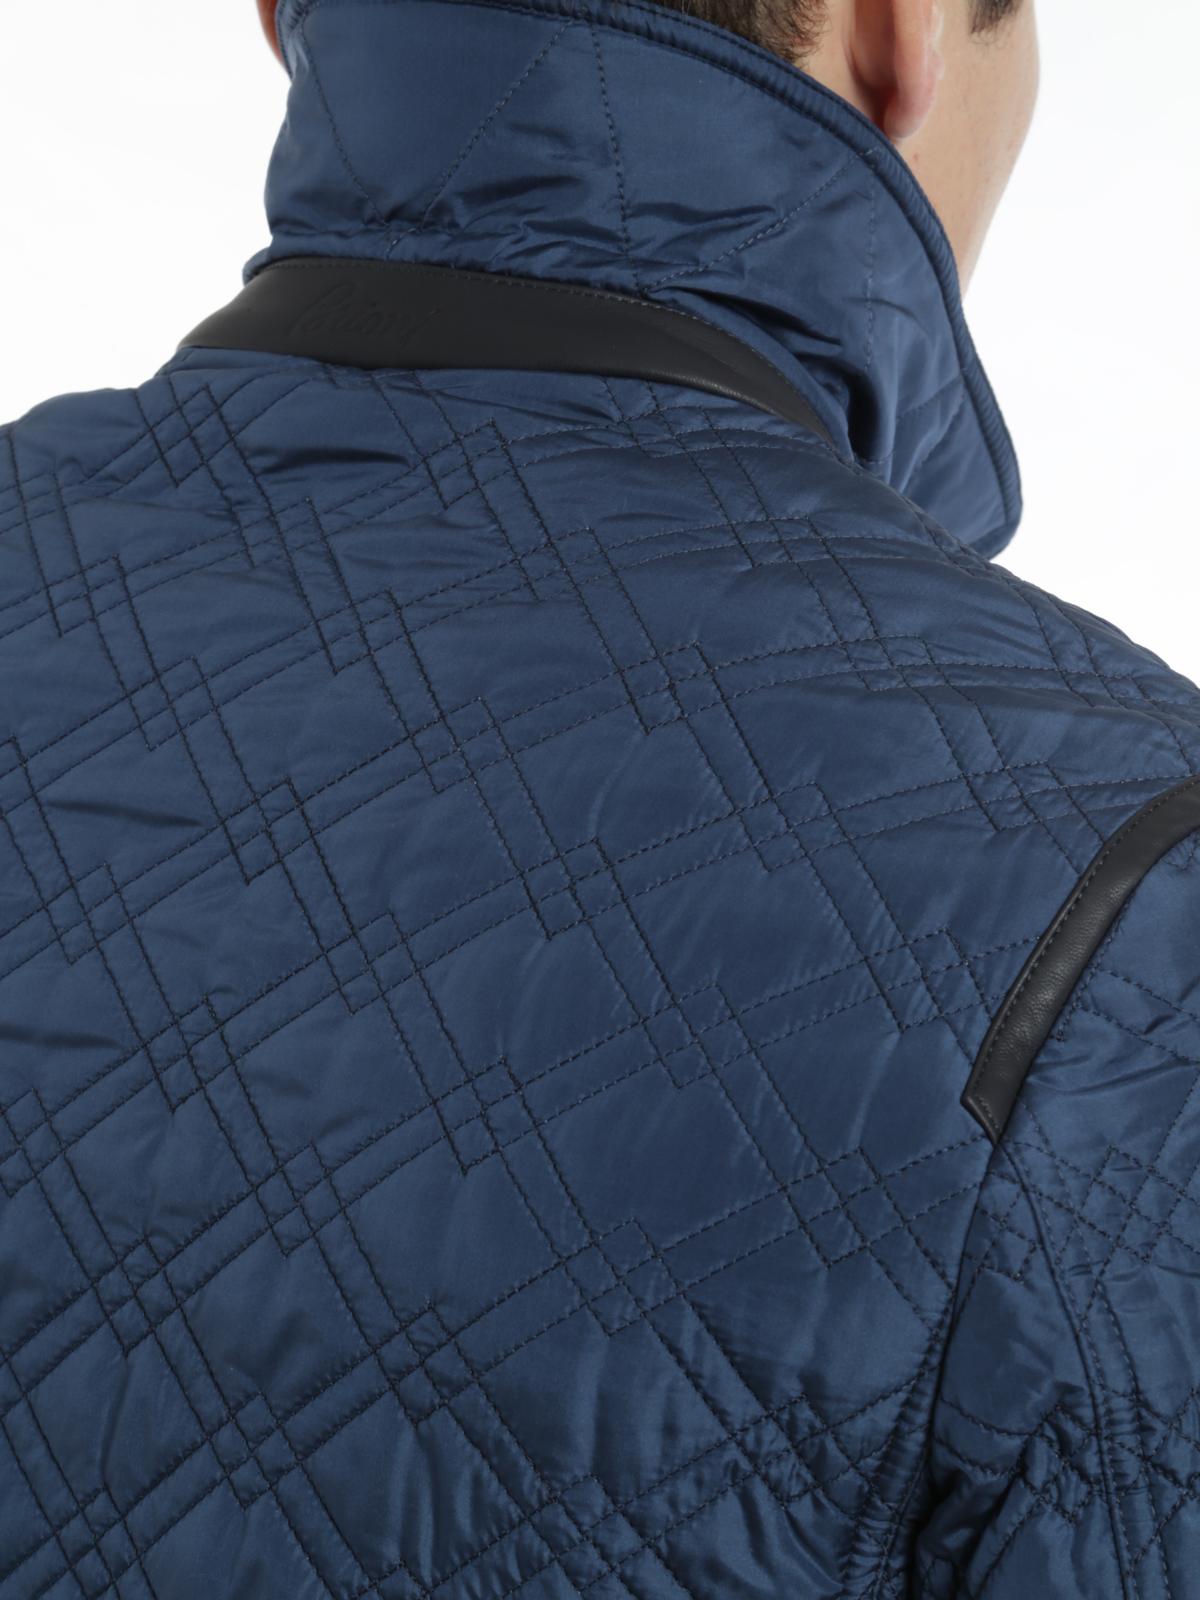 quilted quilt item marchbrae emerald barbourladiesfortrosequiltemerald jackets model barbour jacket fortrose ladies